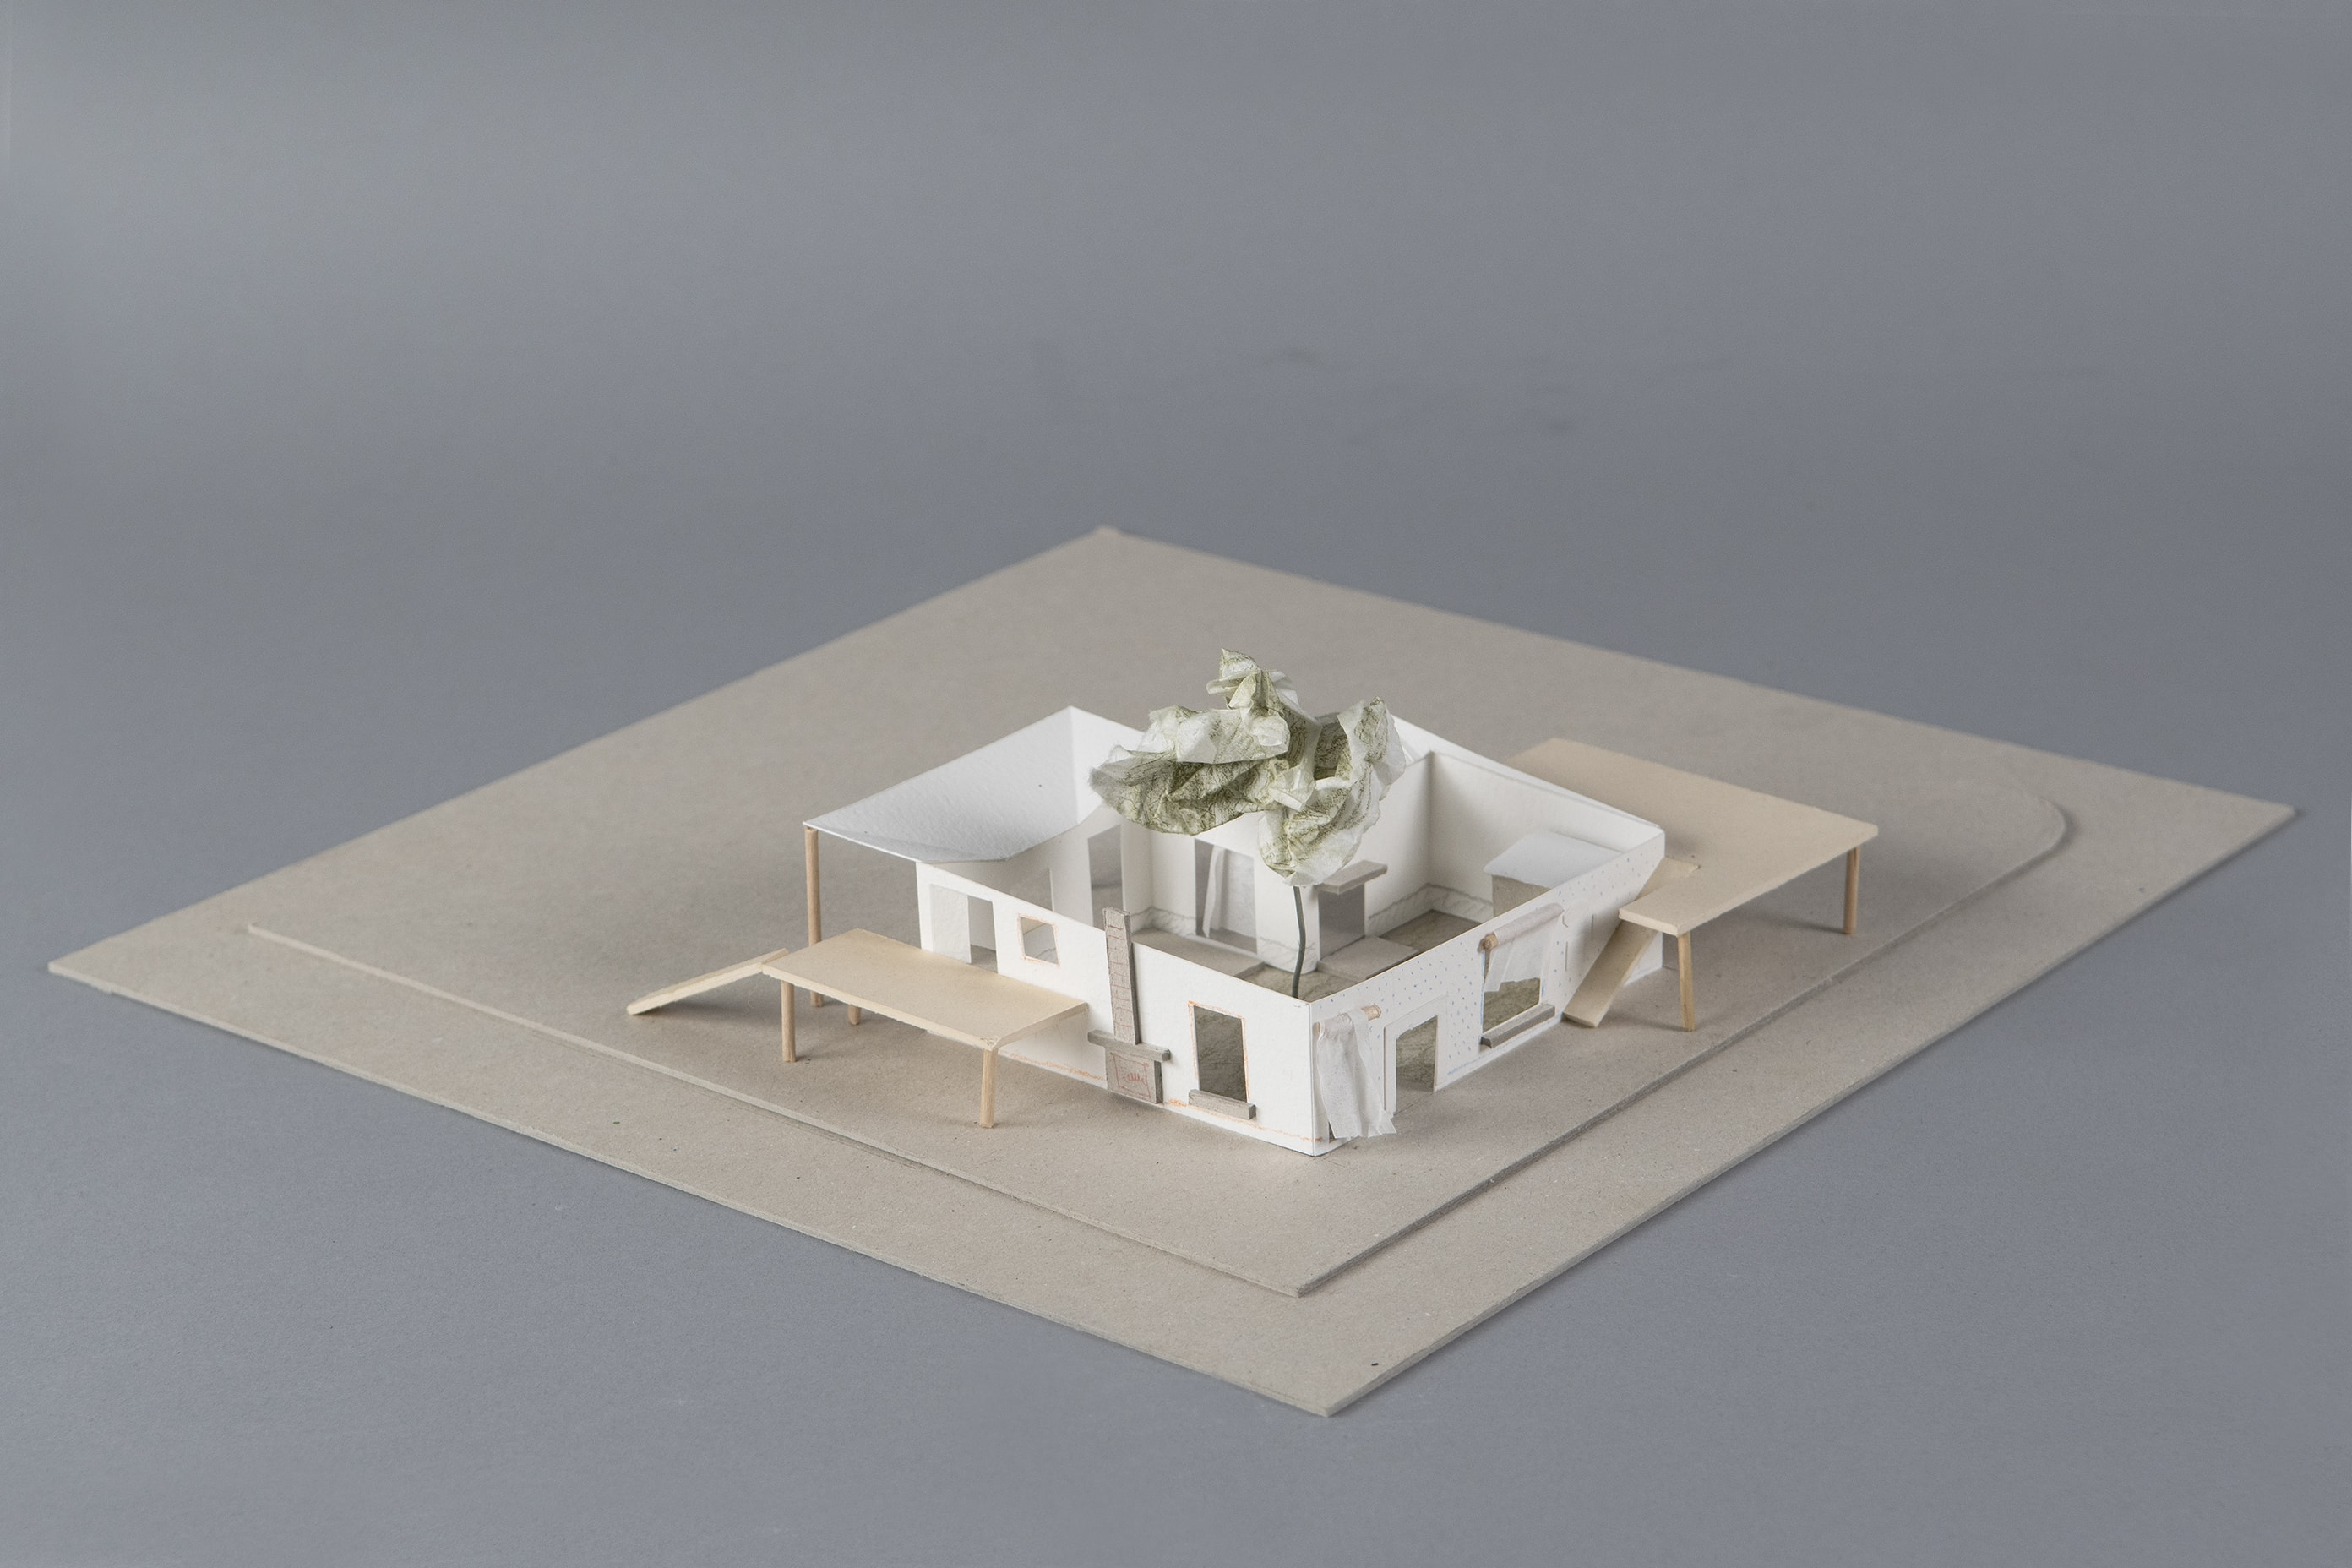 Maison inverse model